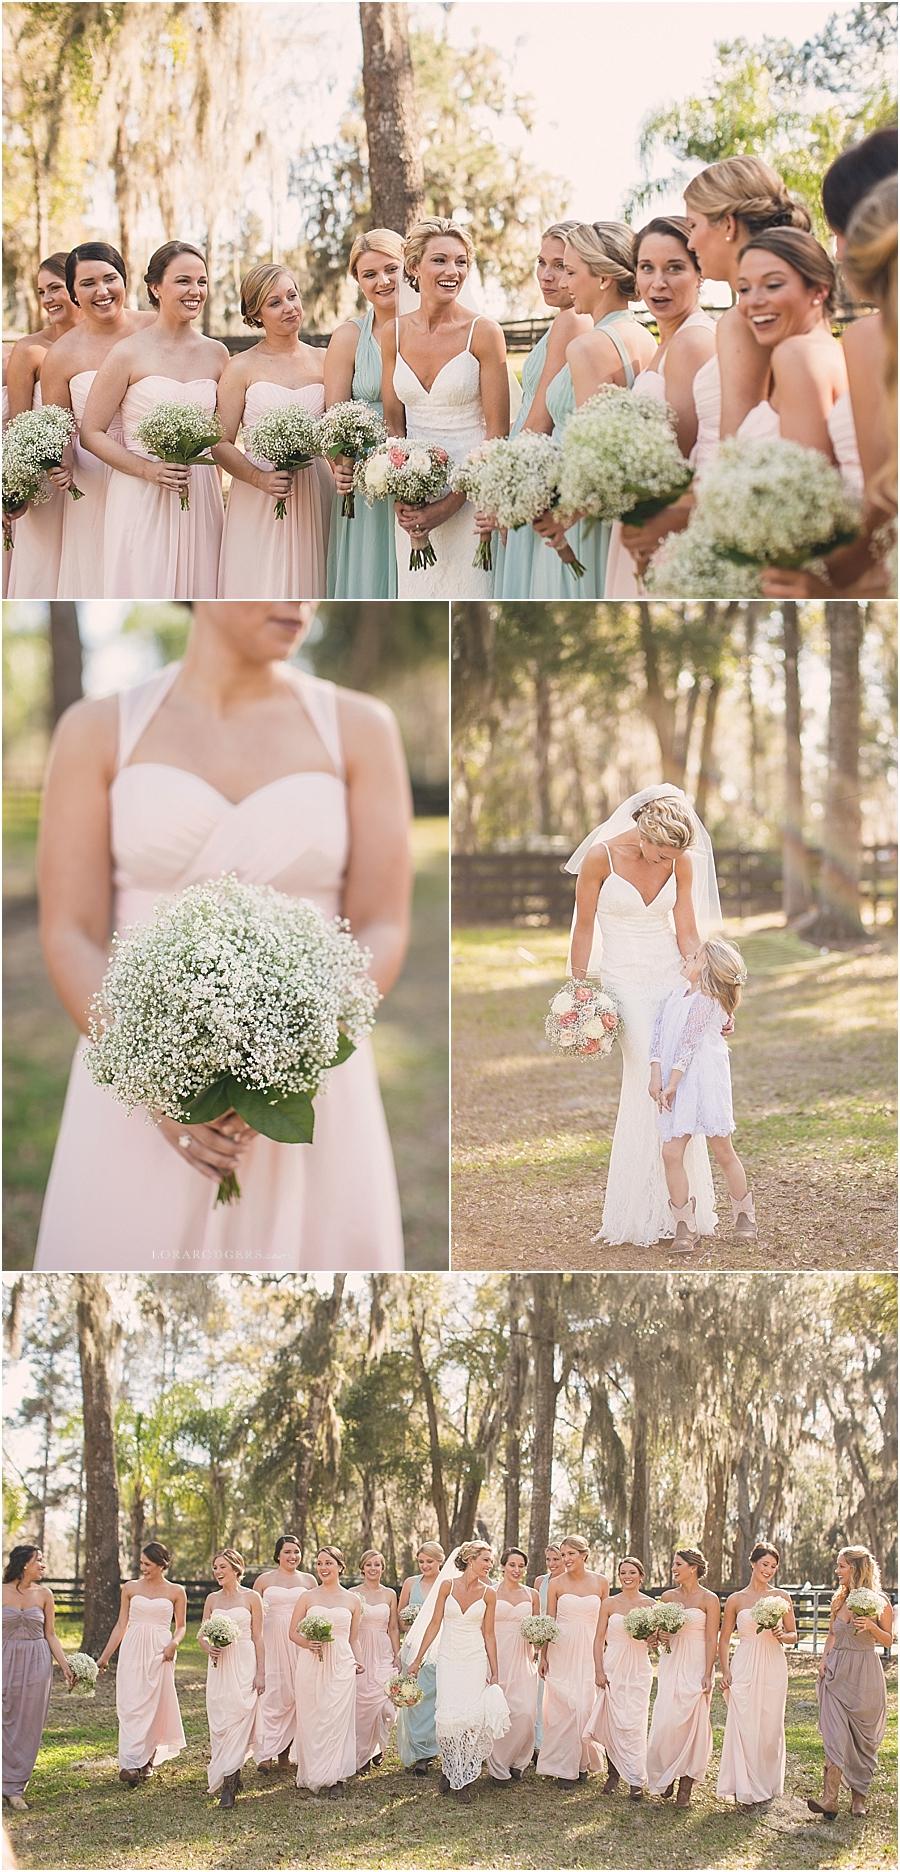 Country_Chic_Ocala_Wedding_004